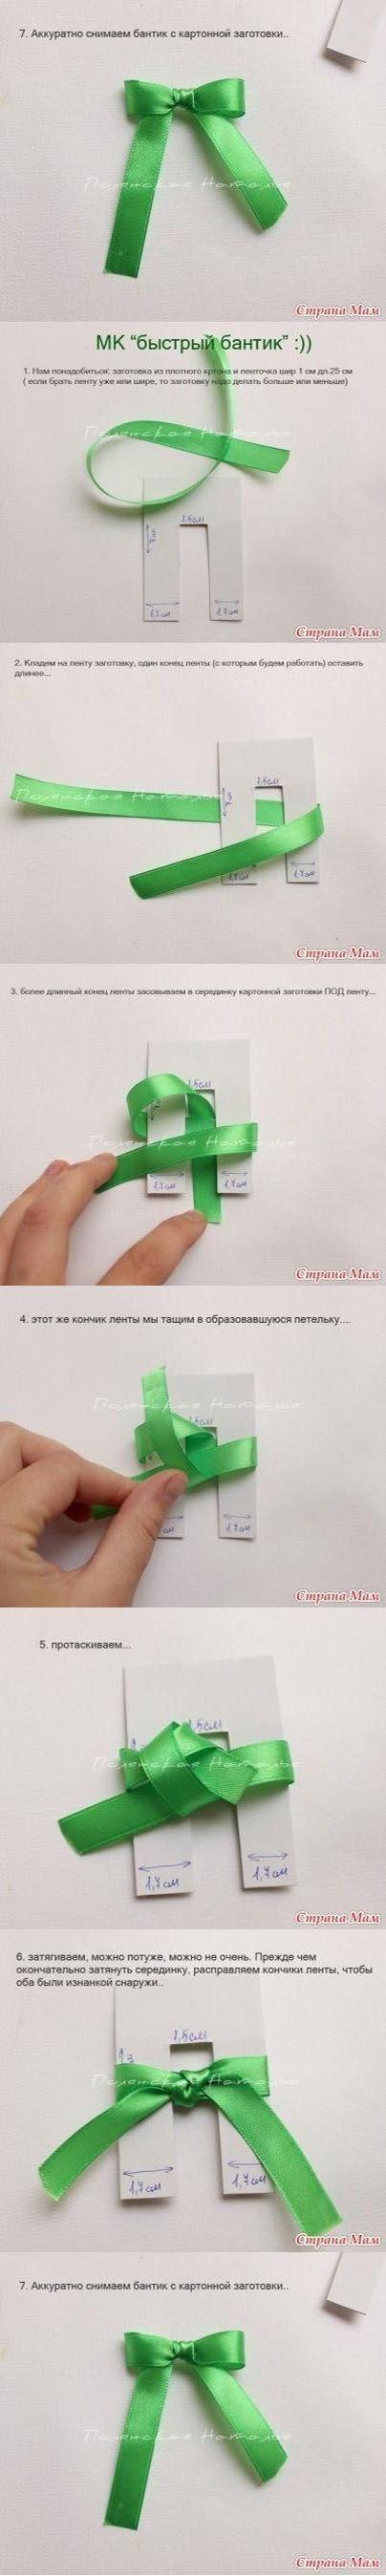 Beautiful Green Bow | DIY & Crafts Tutorials